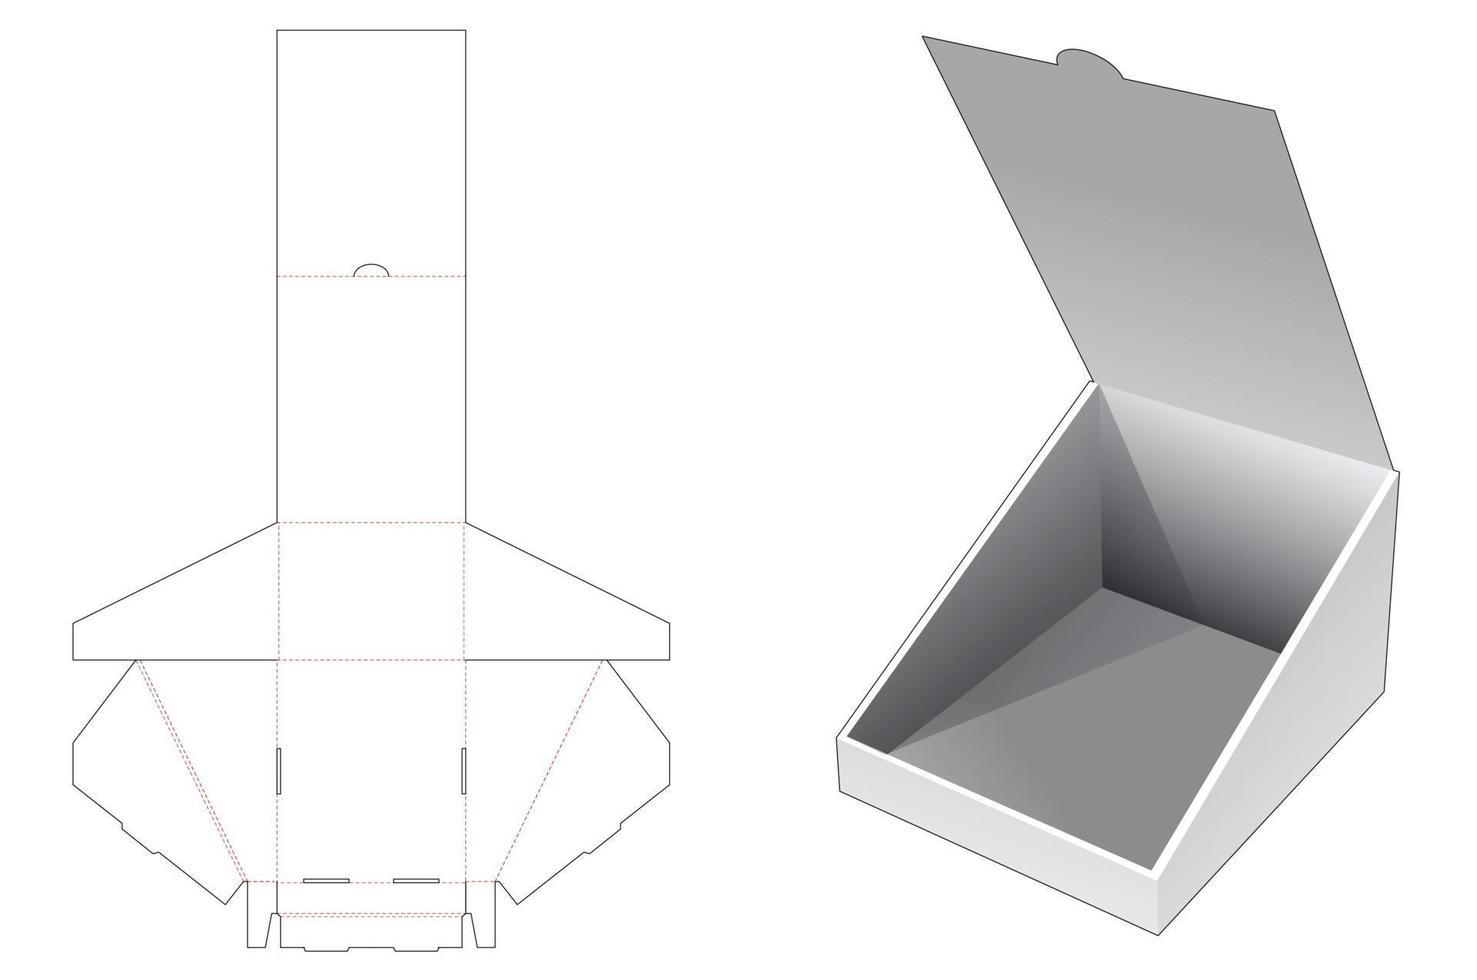 molde de corte e vinco dobrável flip slope box vetor